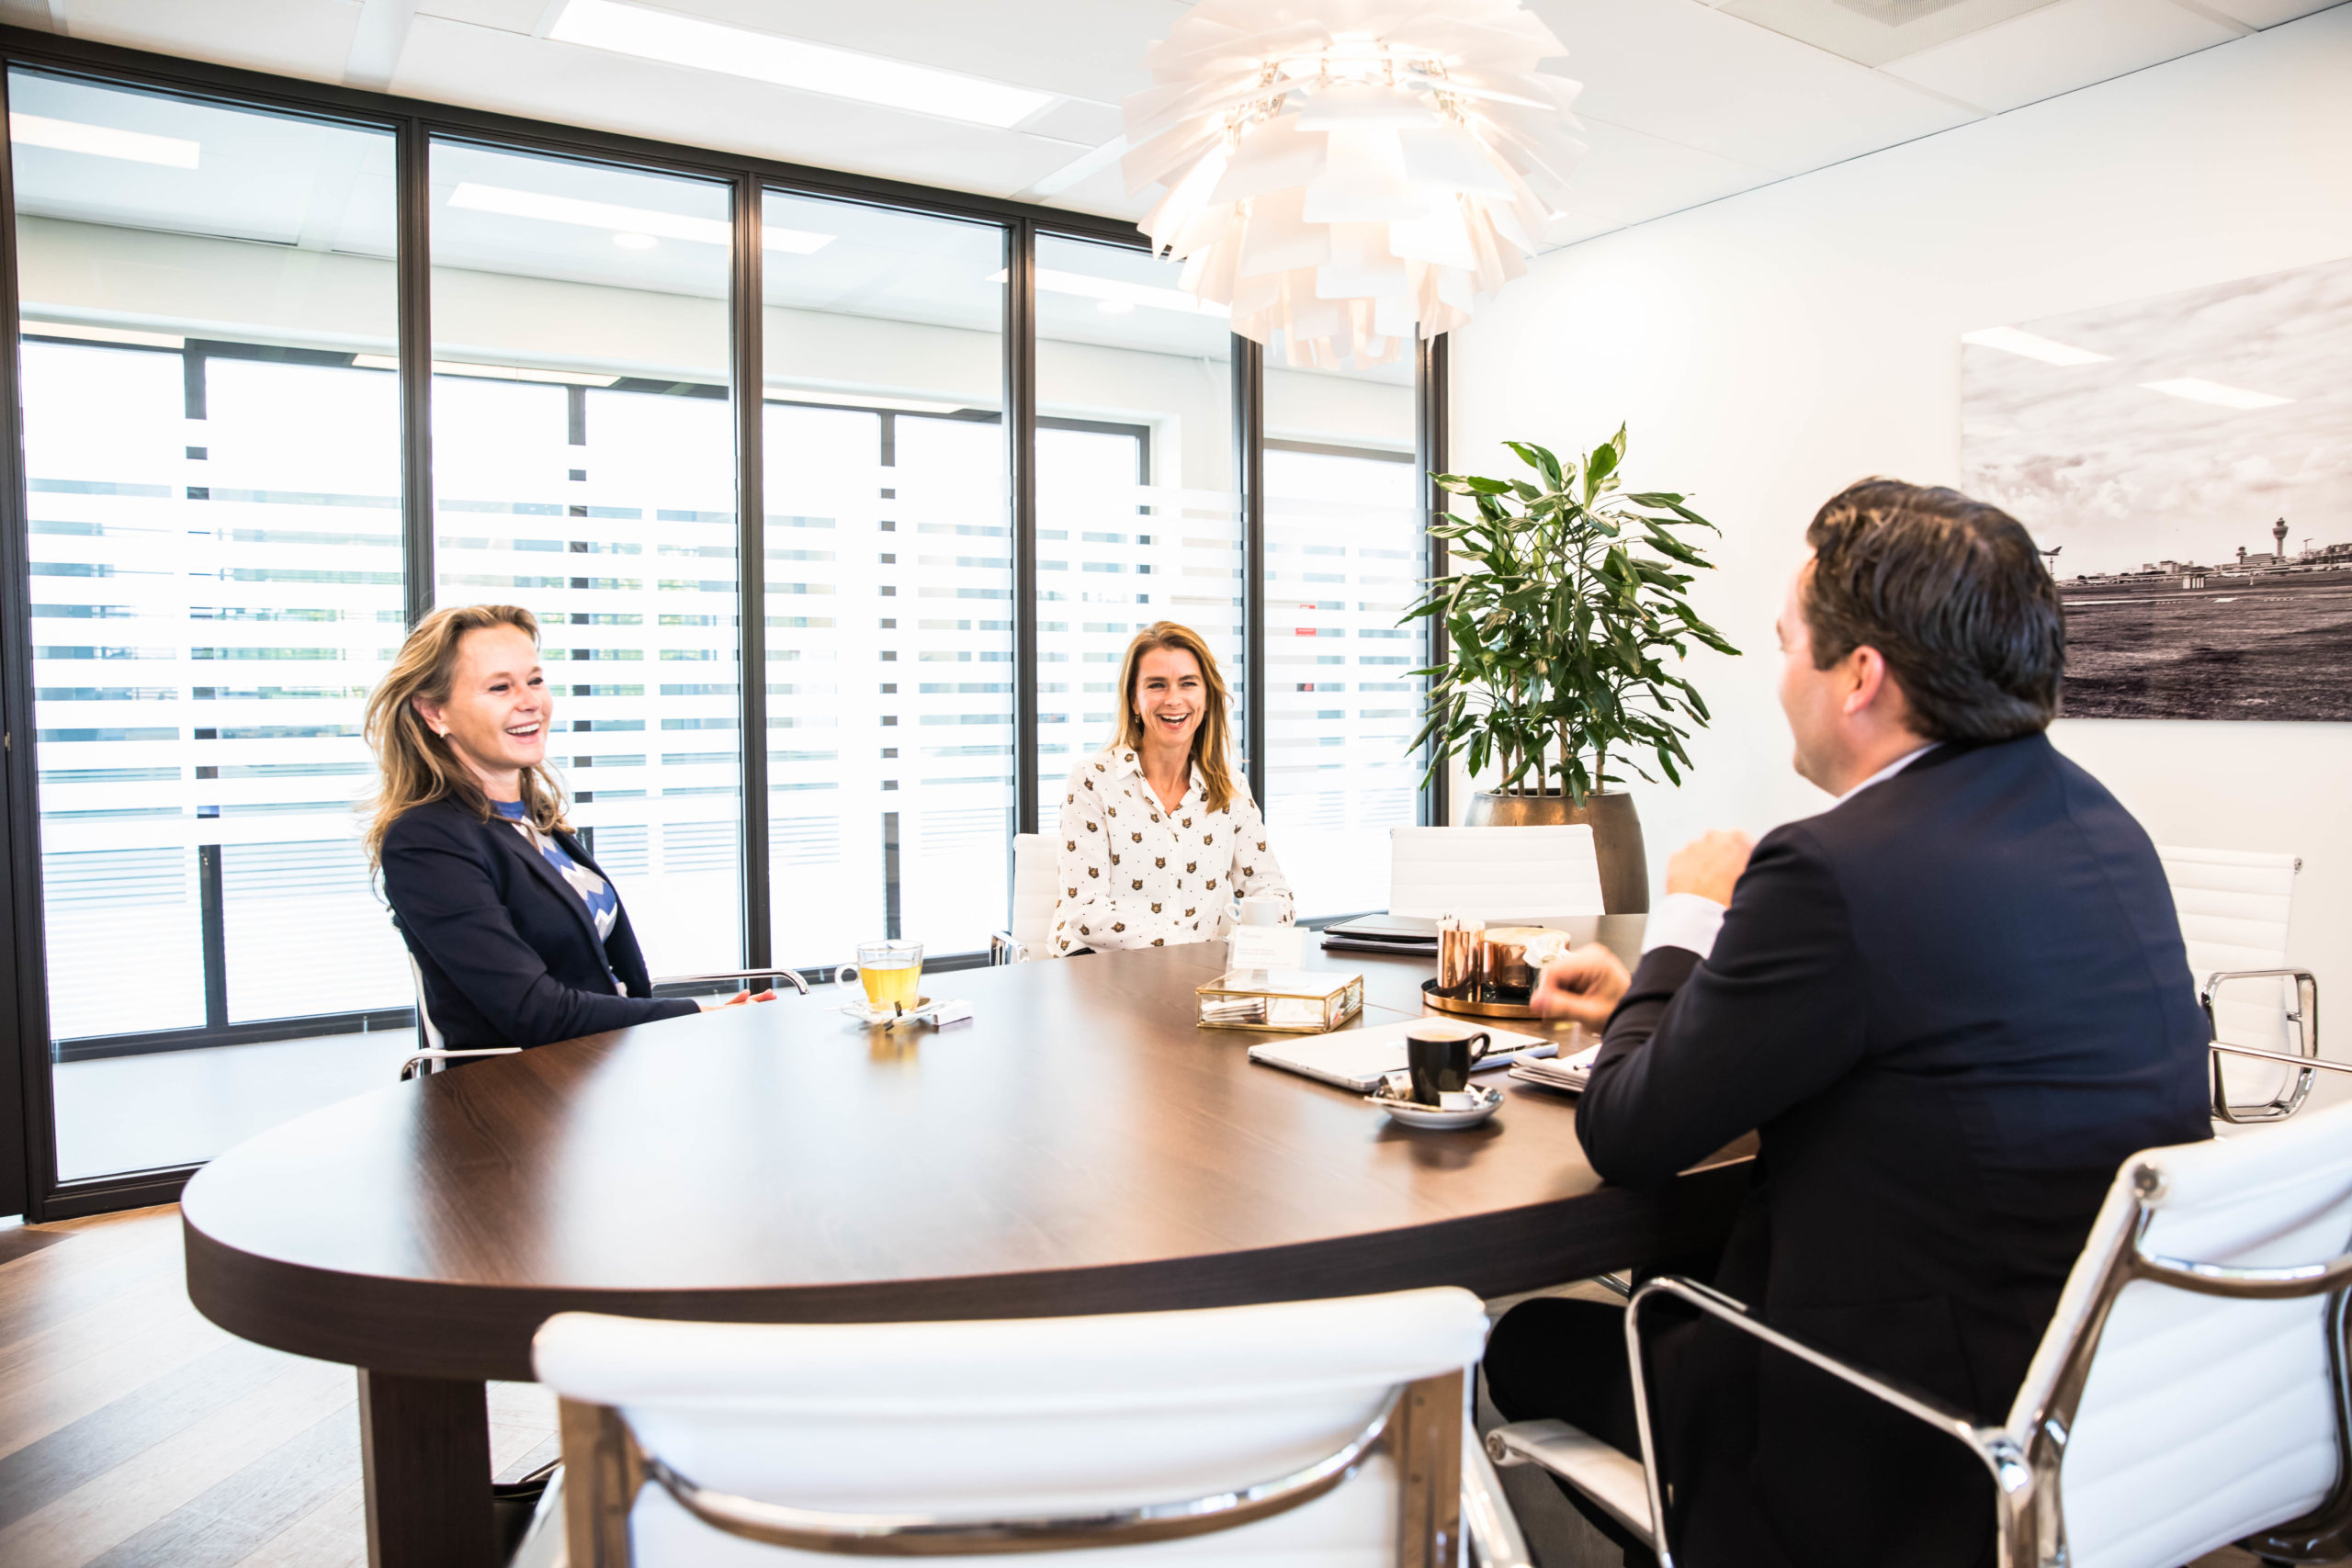 MBI (Management Buy In) via Marktlink Fusies & Overnames